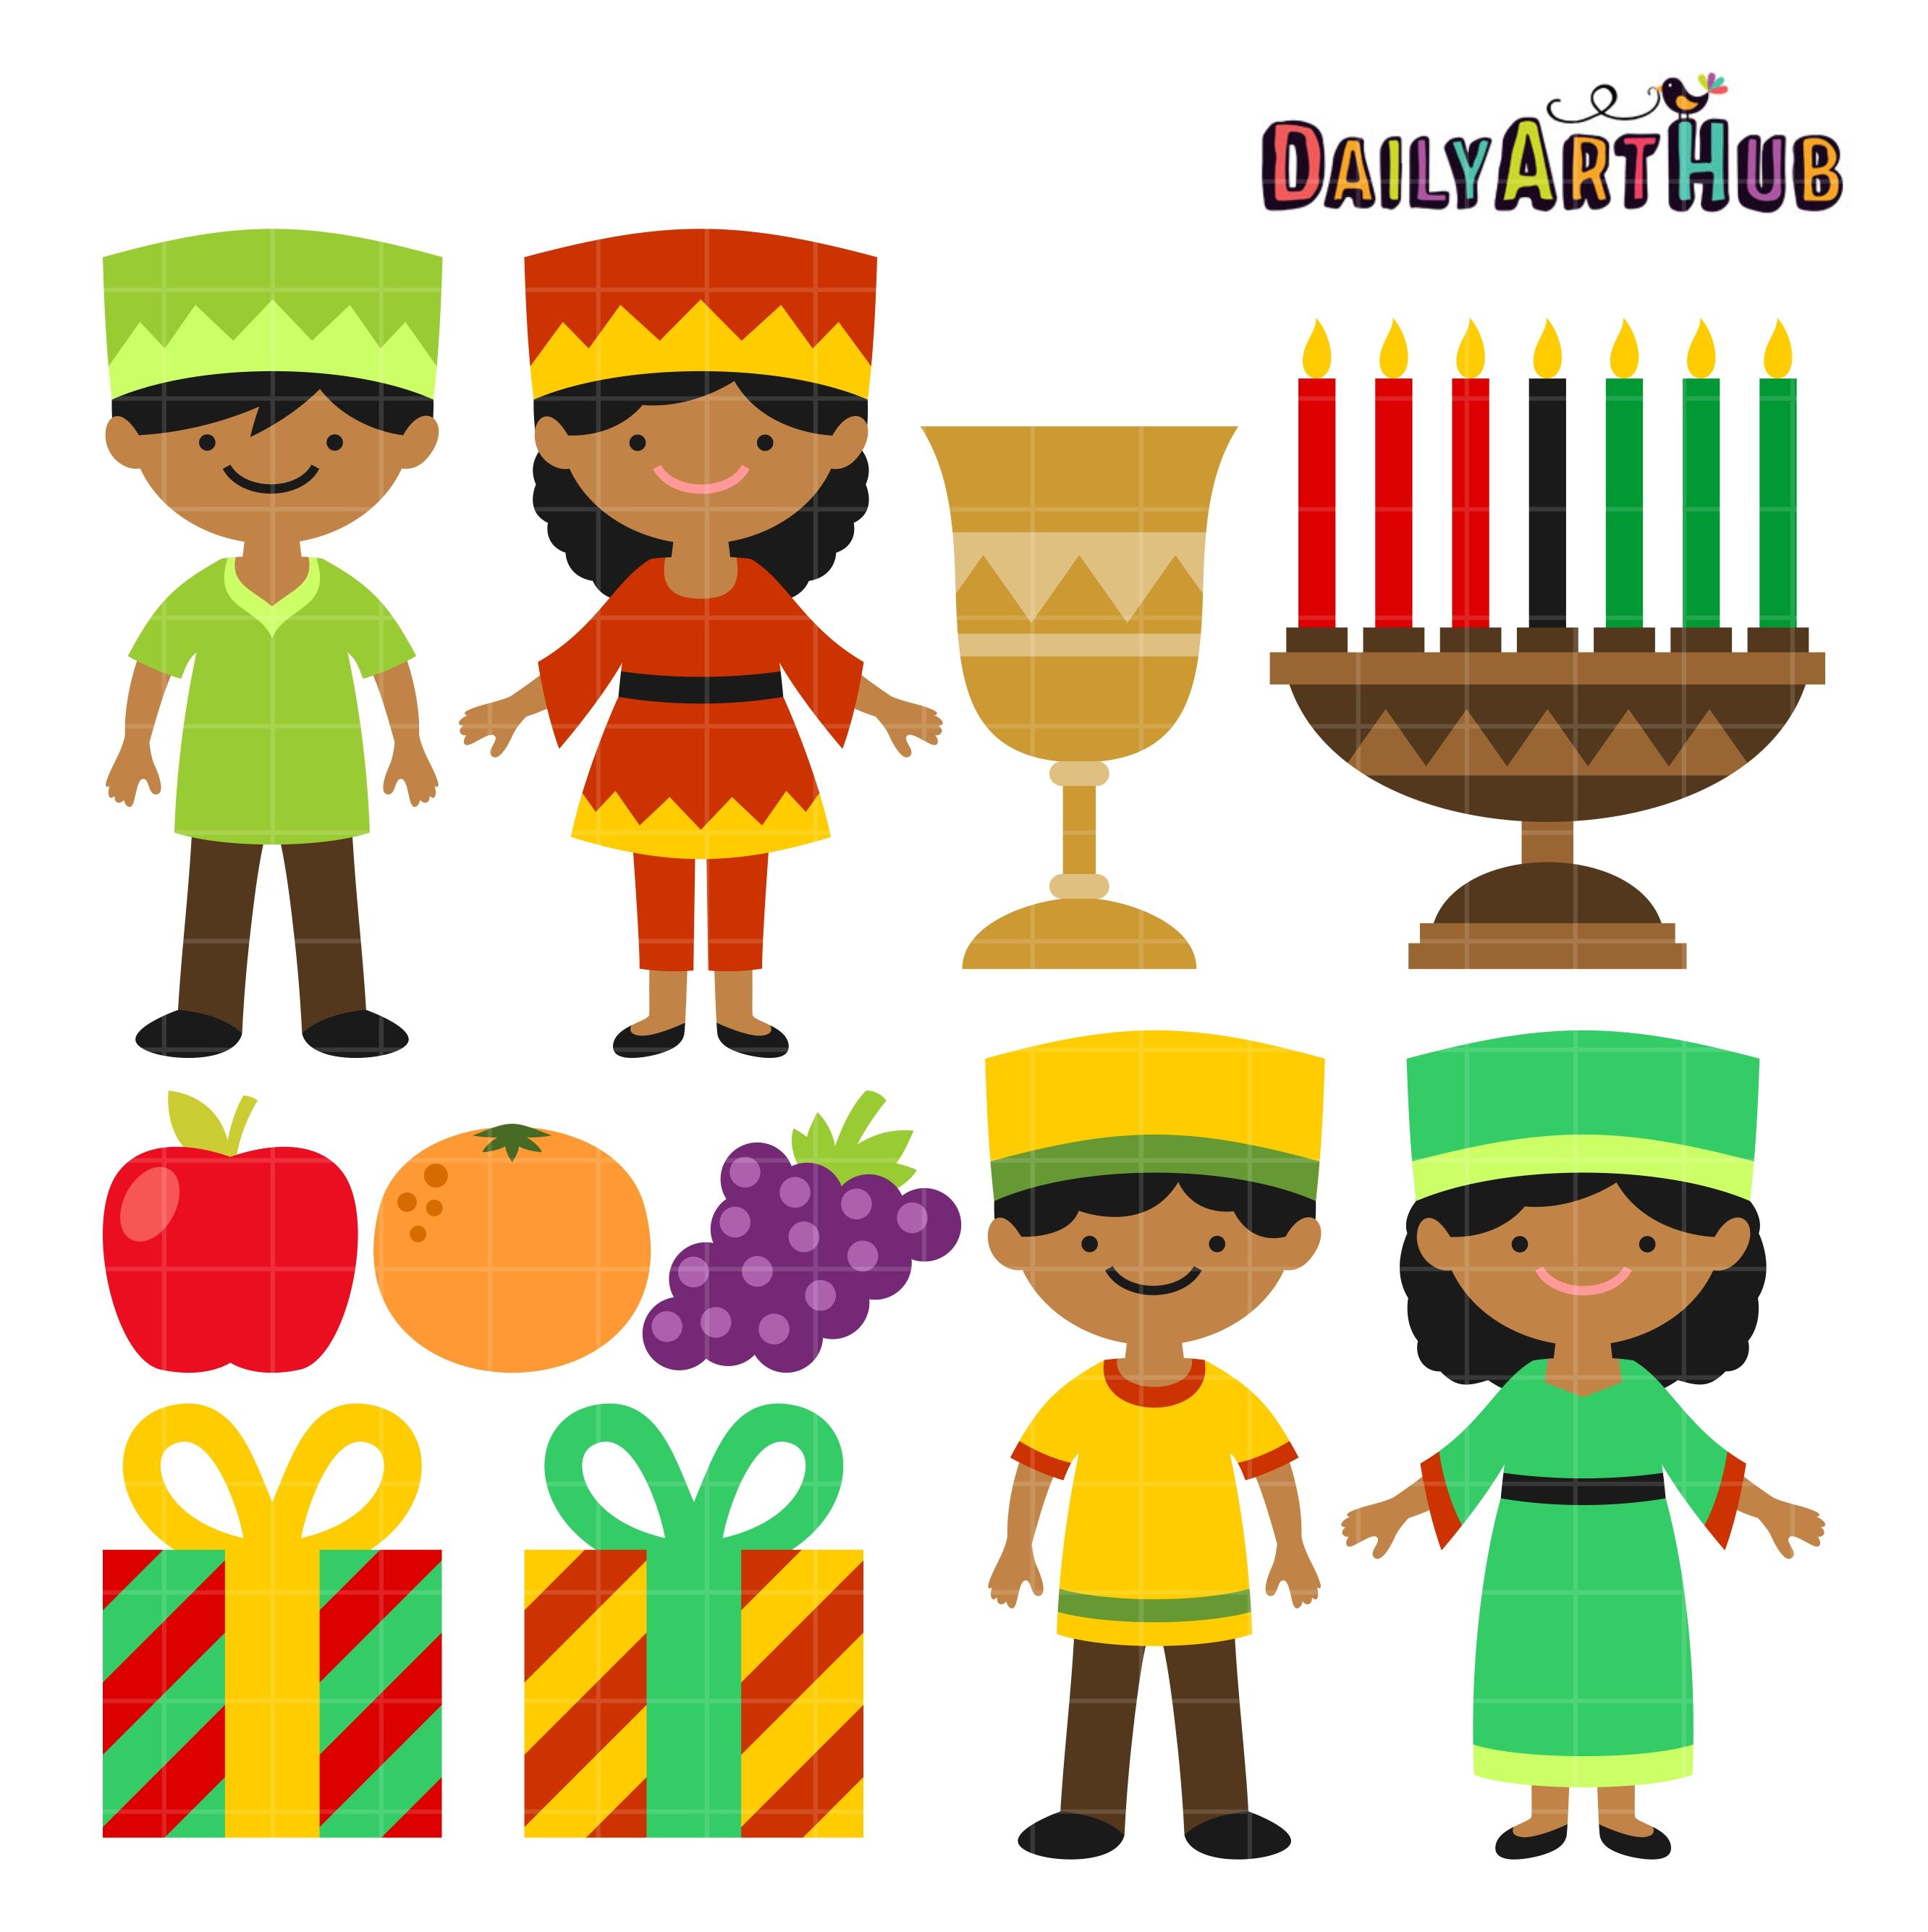 happy kwanzaa kids clip art set daily art hub free clip art everyday rh dailyarthub com happy kwanzaa clipart kwanzaa food clipart